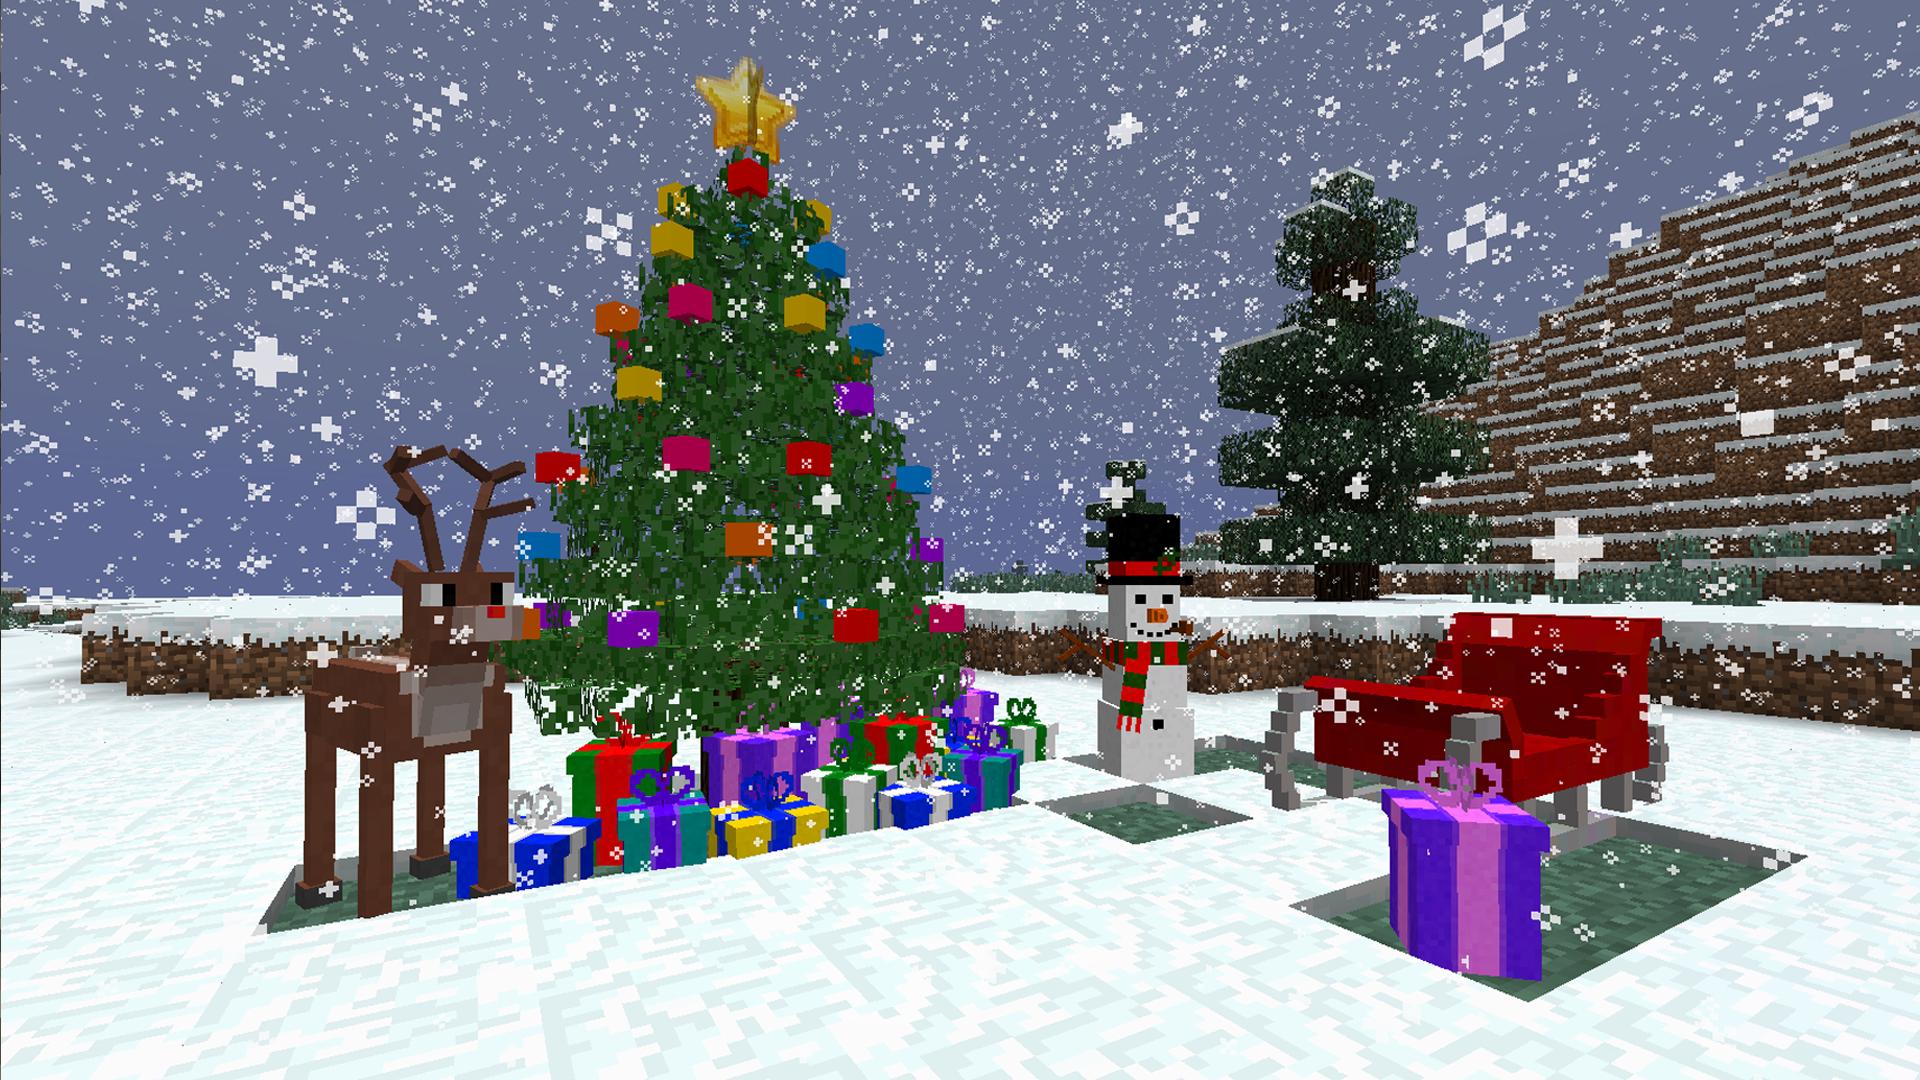 скачать моды на майнкрафт 1.7.2 на рождество christmascraft #7